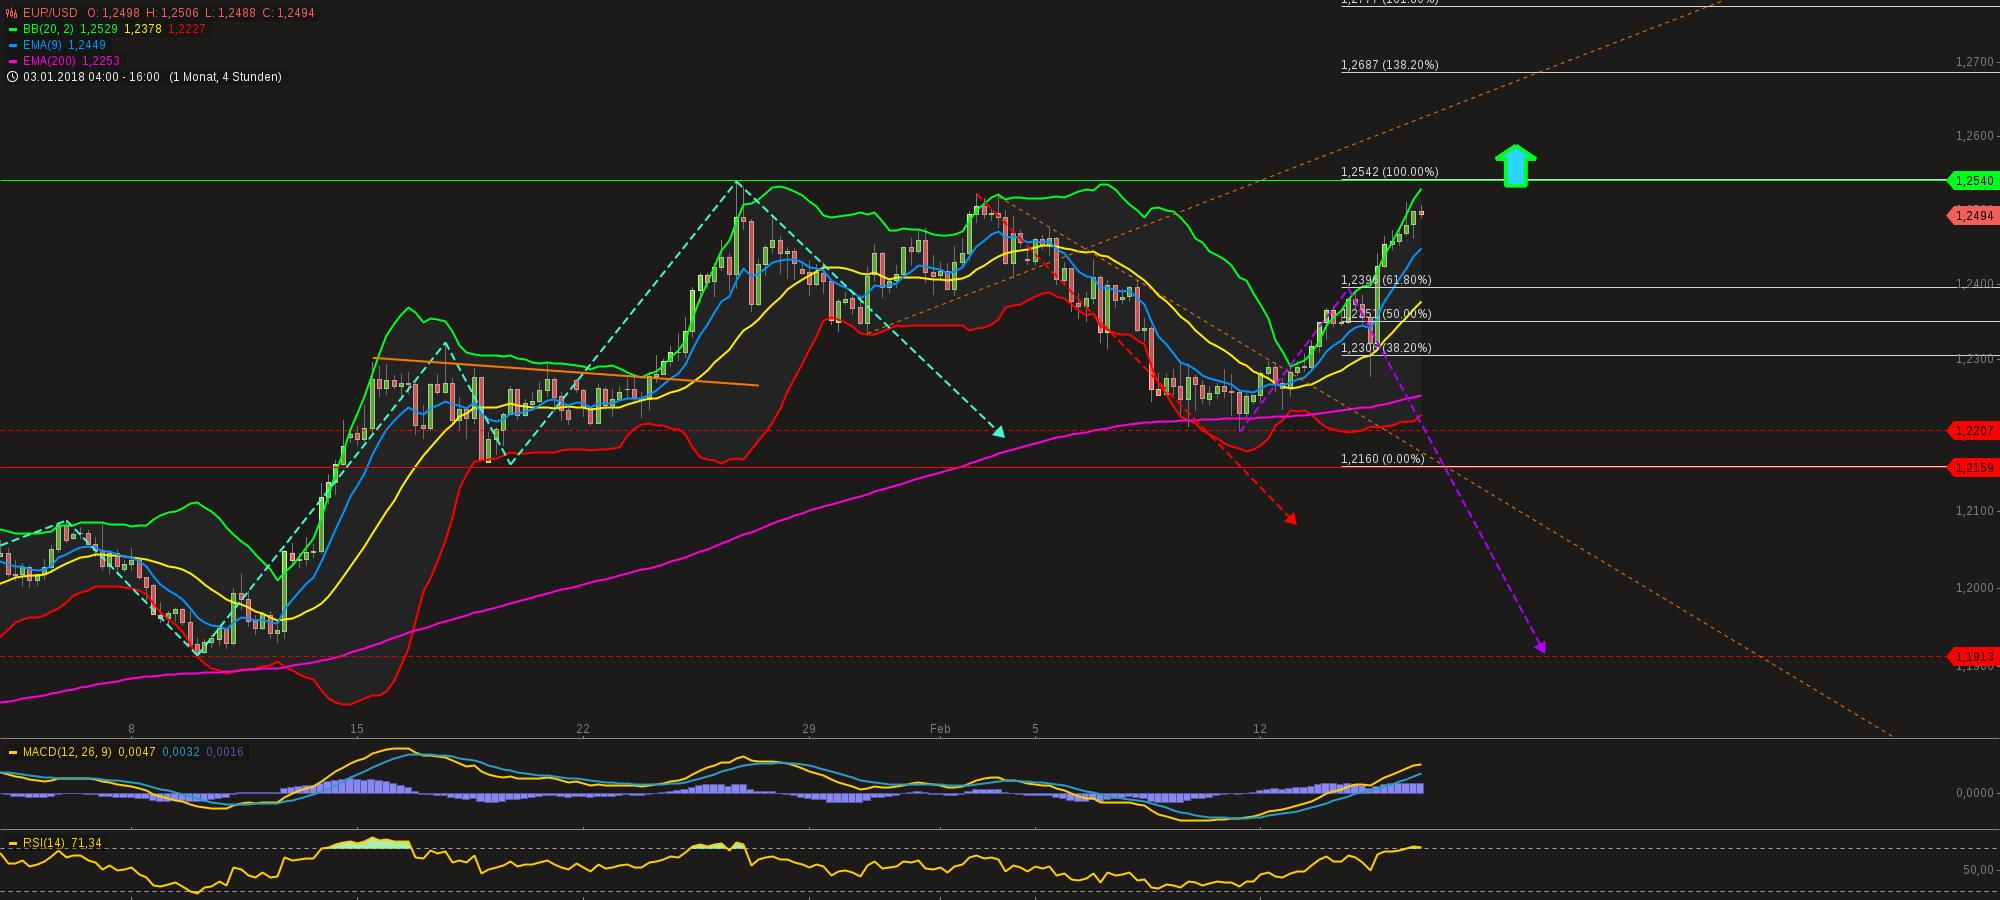 chart-15022018-1606-eurusd.png